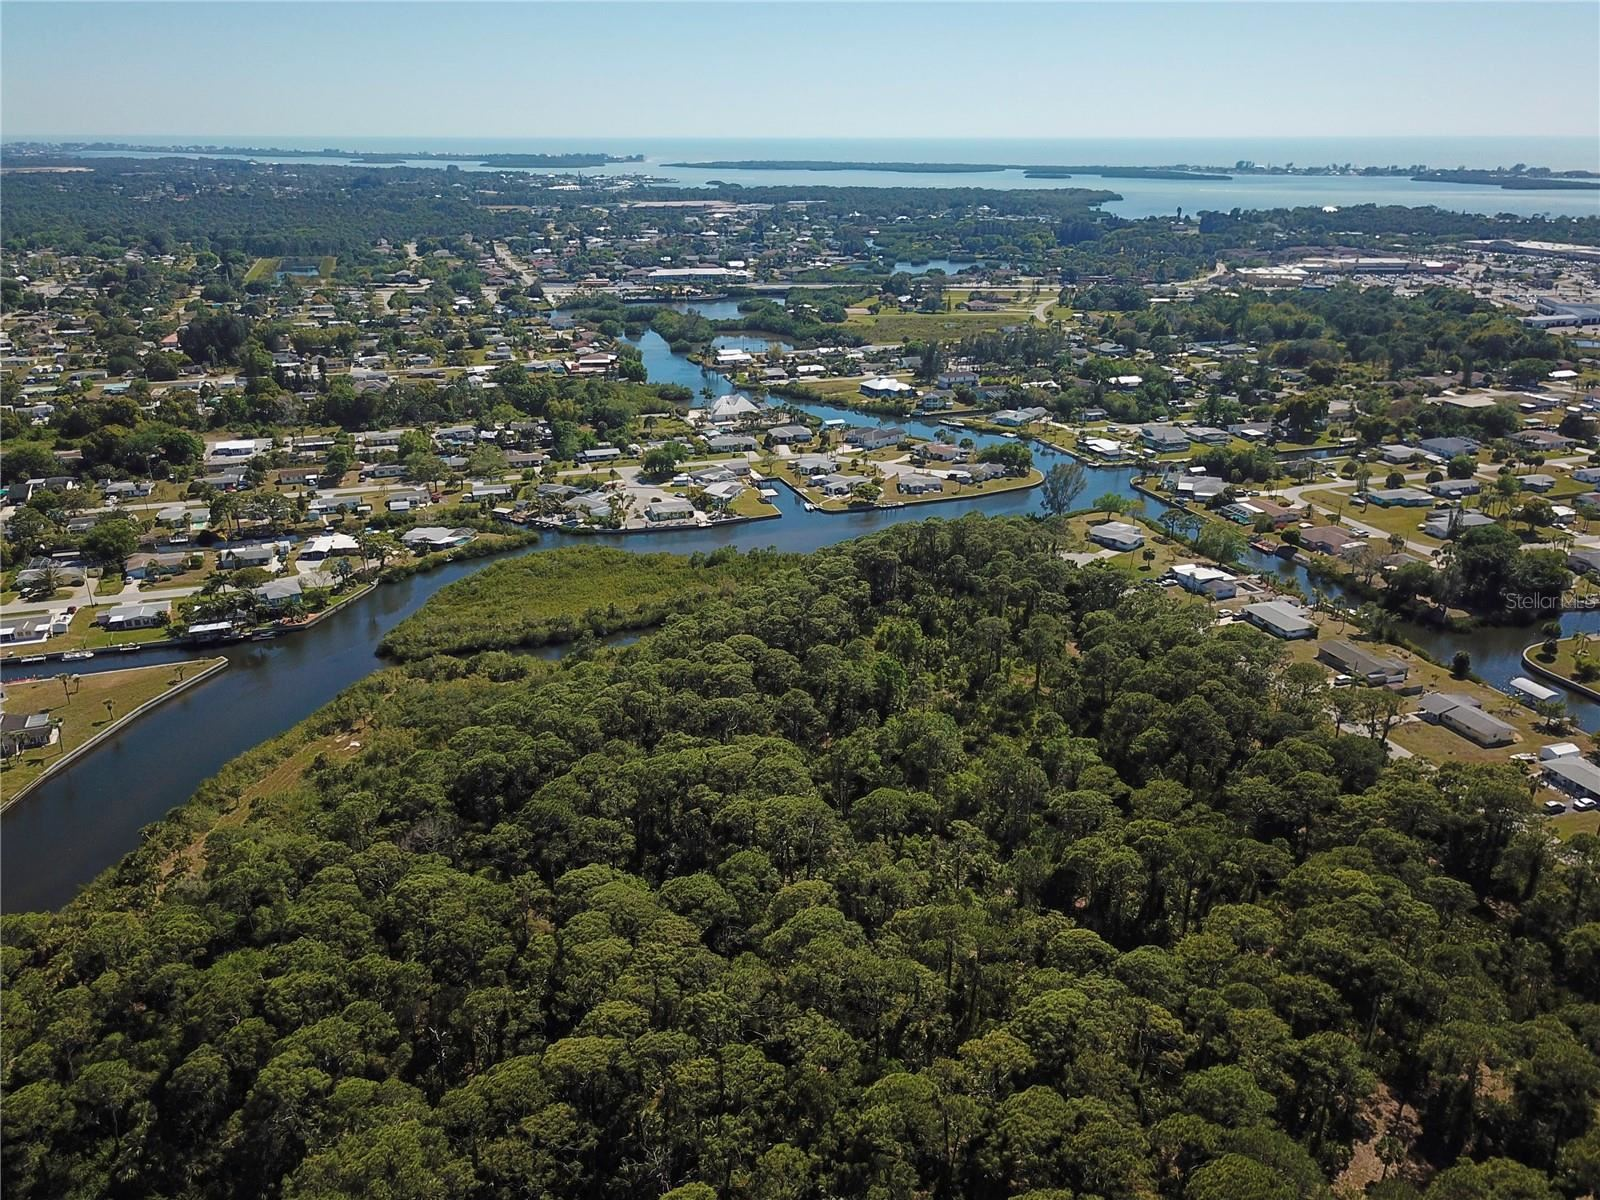 Photo of 1121 LAMPP DRIVE, ENGLEWOOD, FL 34223 (MLS # D6121718)